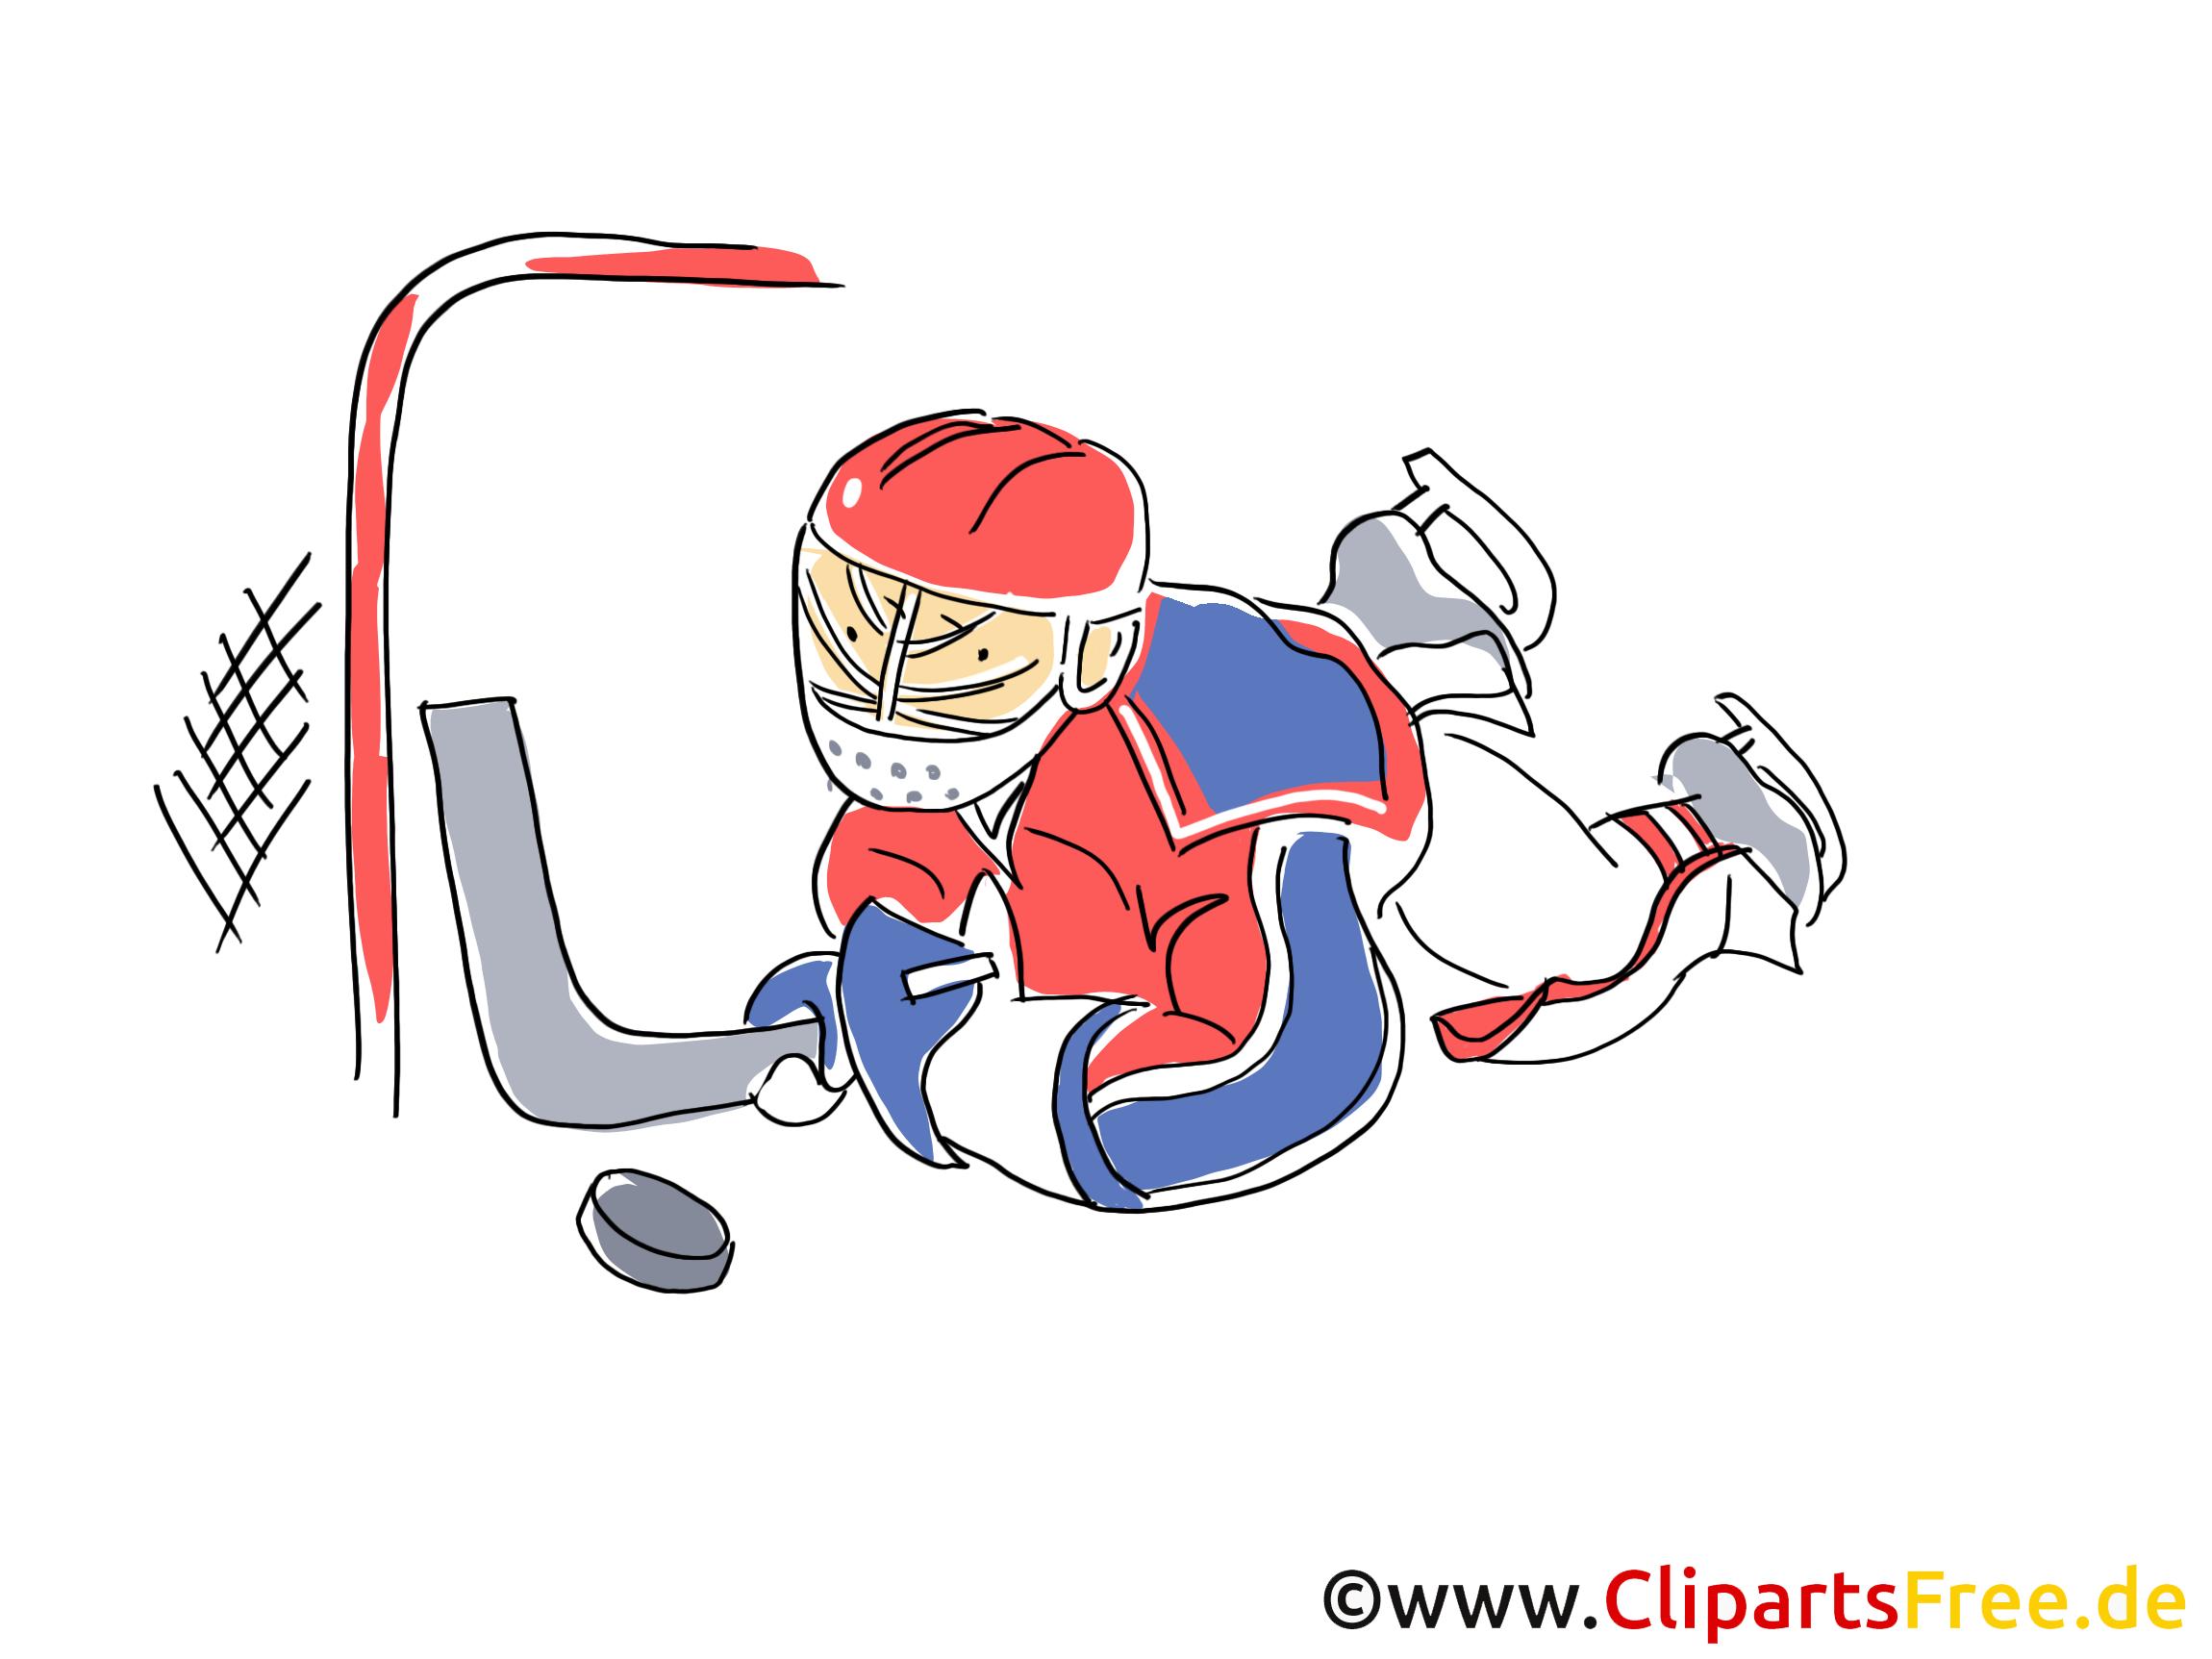 Attaque dessin gratuit - Hockey image